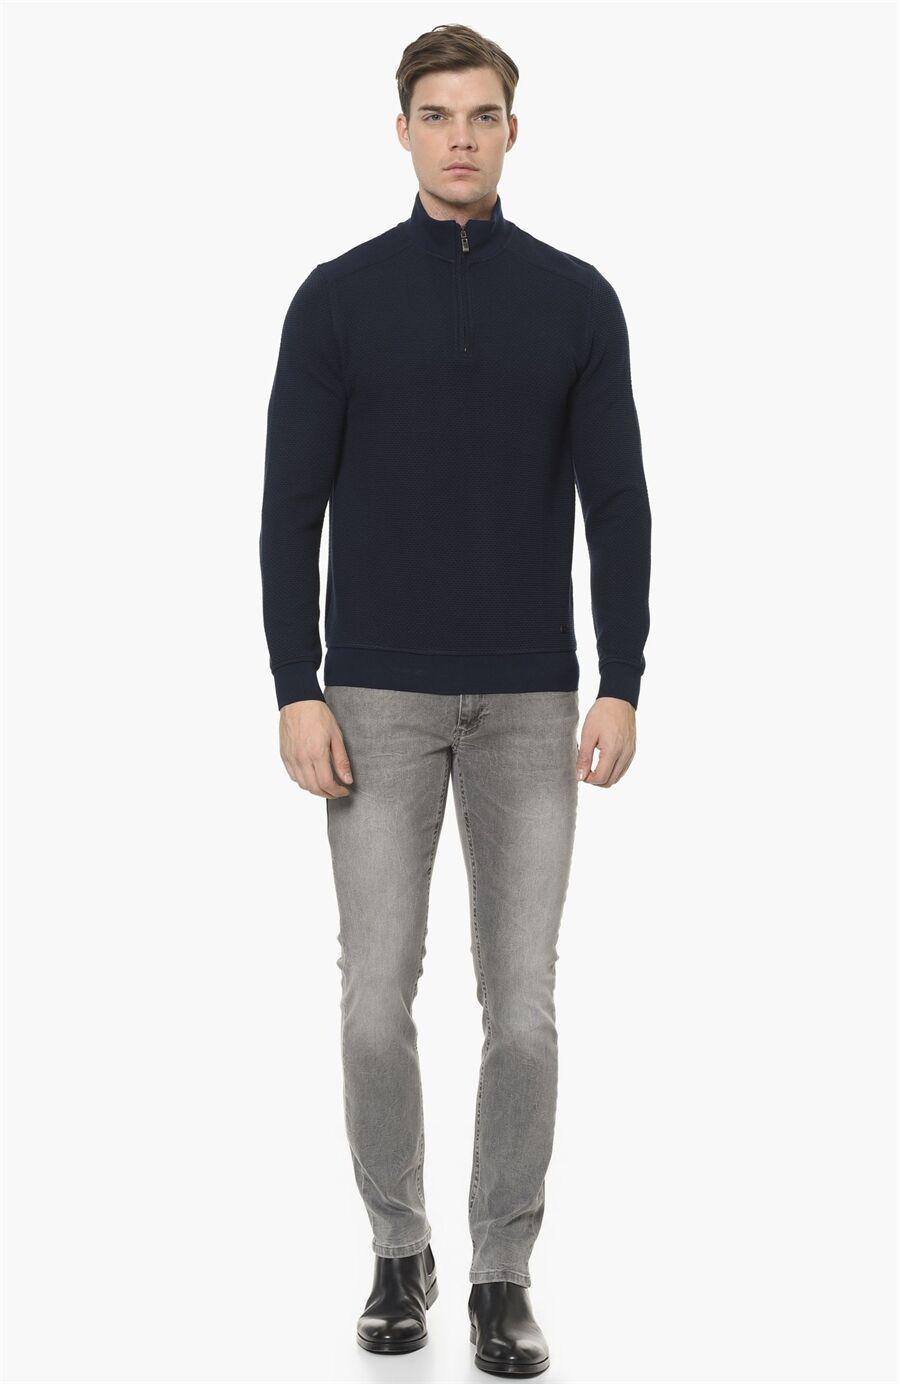 Mikro Rahat Kesim Lacivert-Kahverengi Sweatshirt